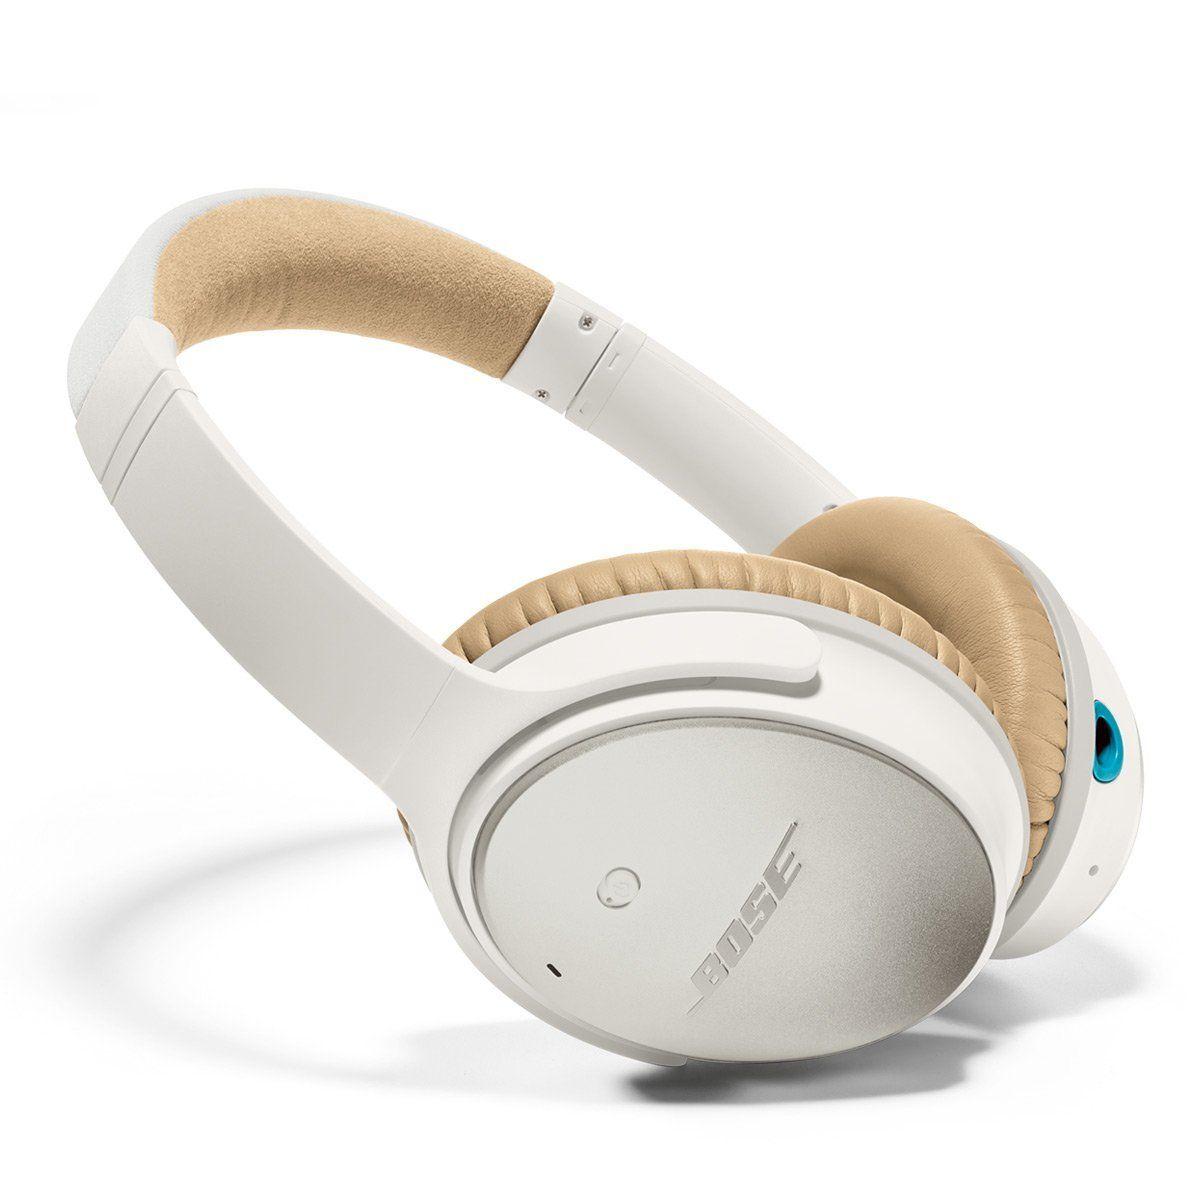 Deals on Noise cancelling headphones, Sound proof